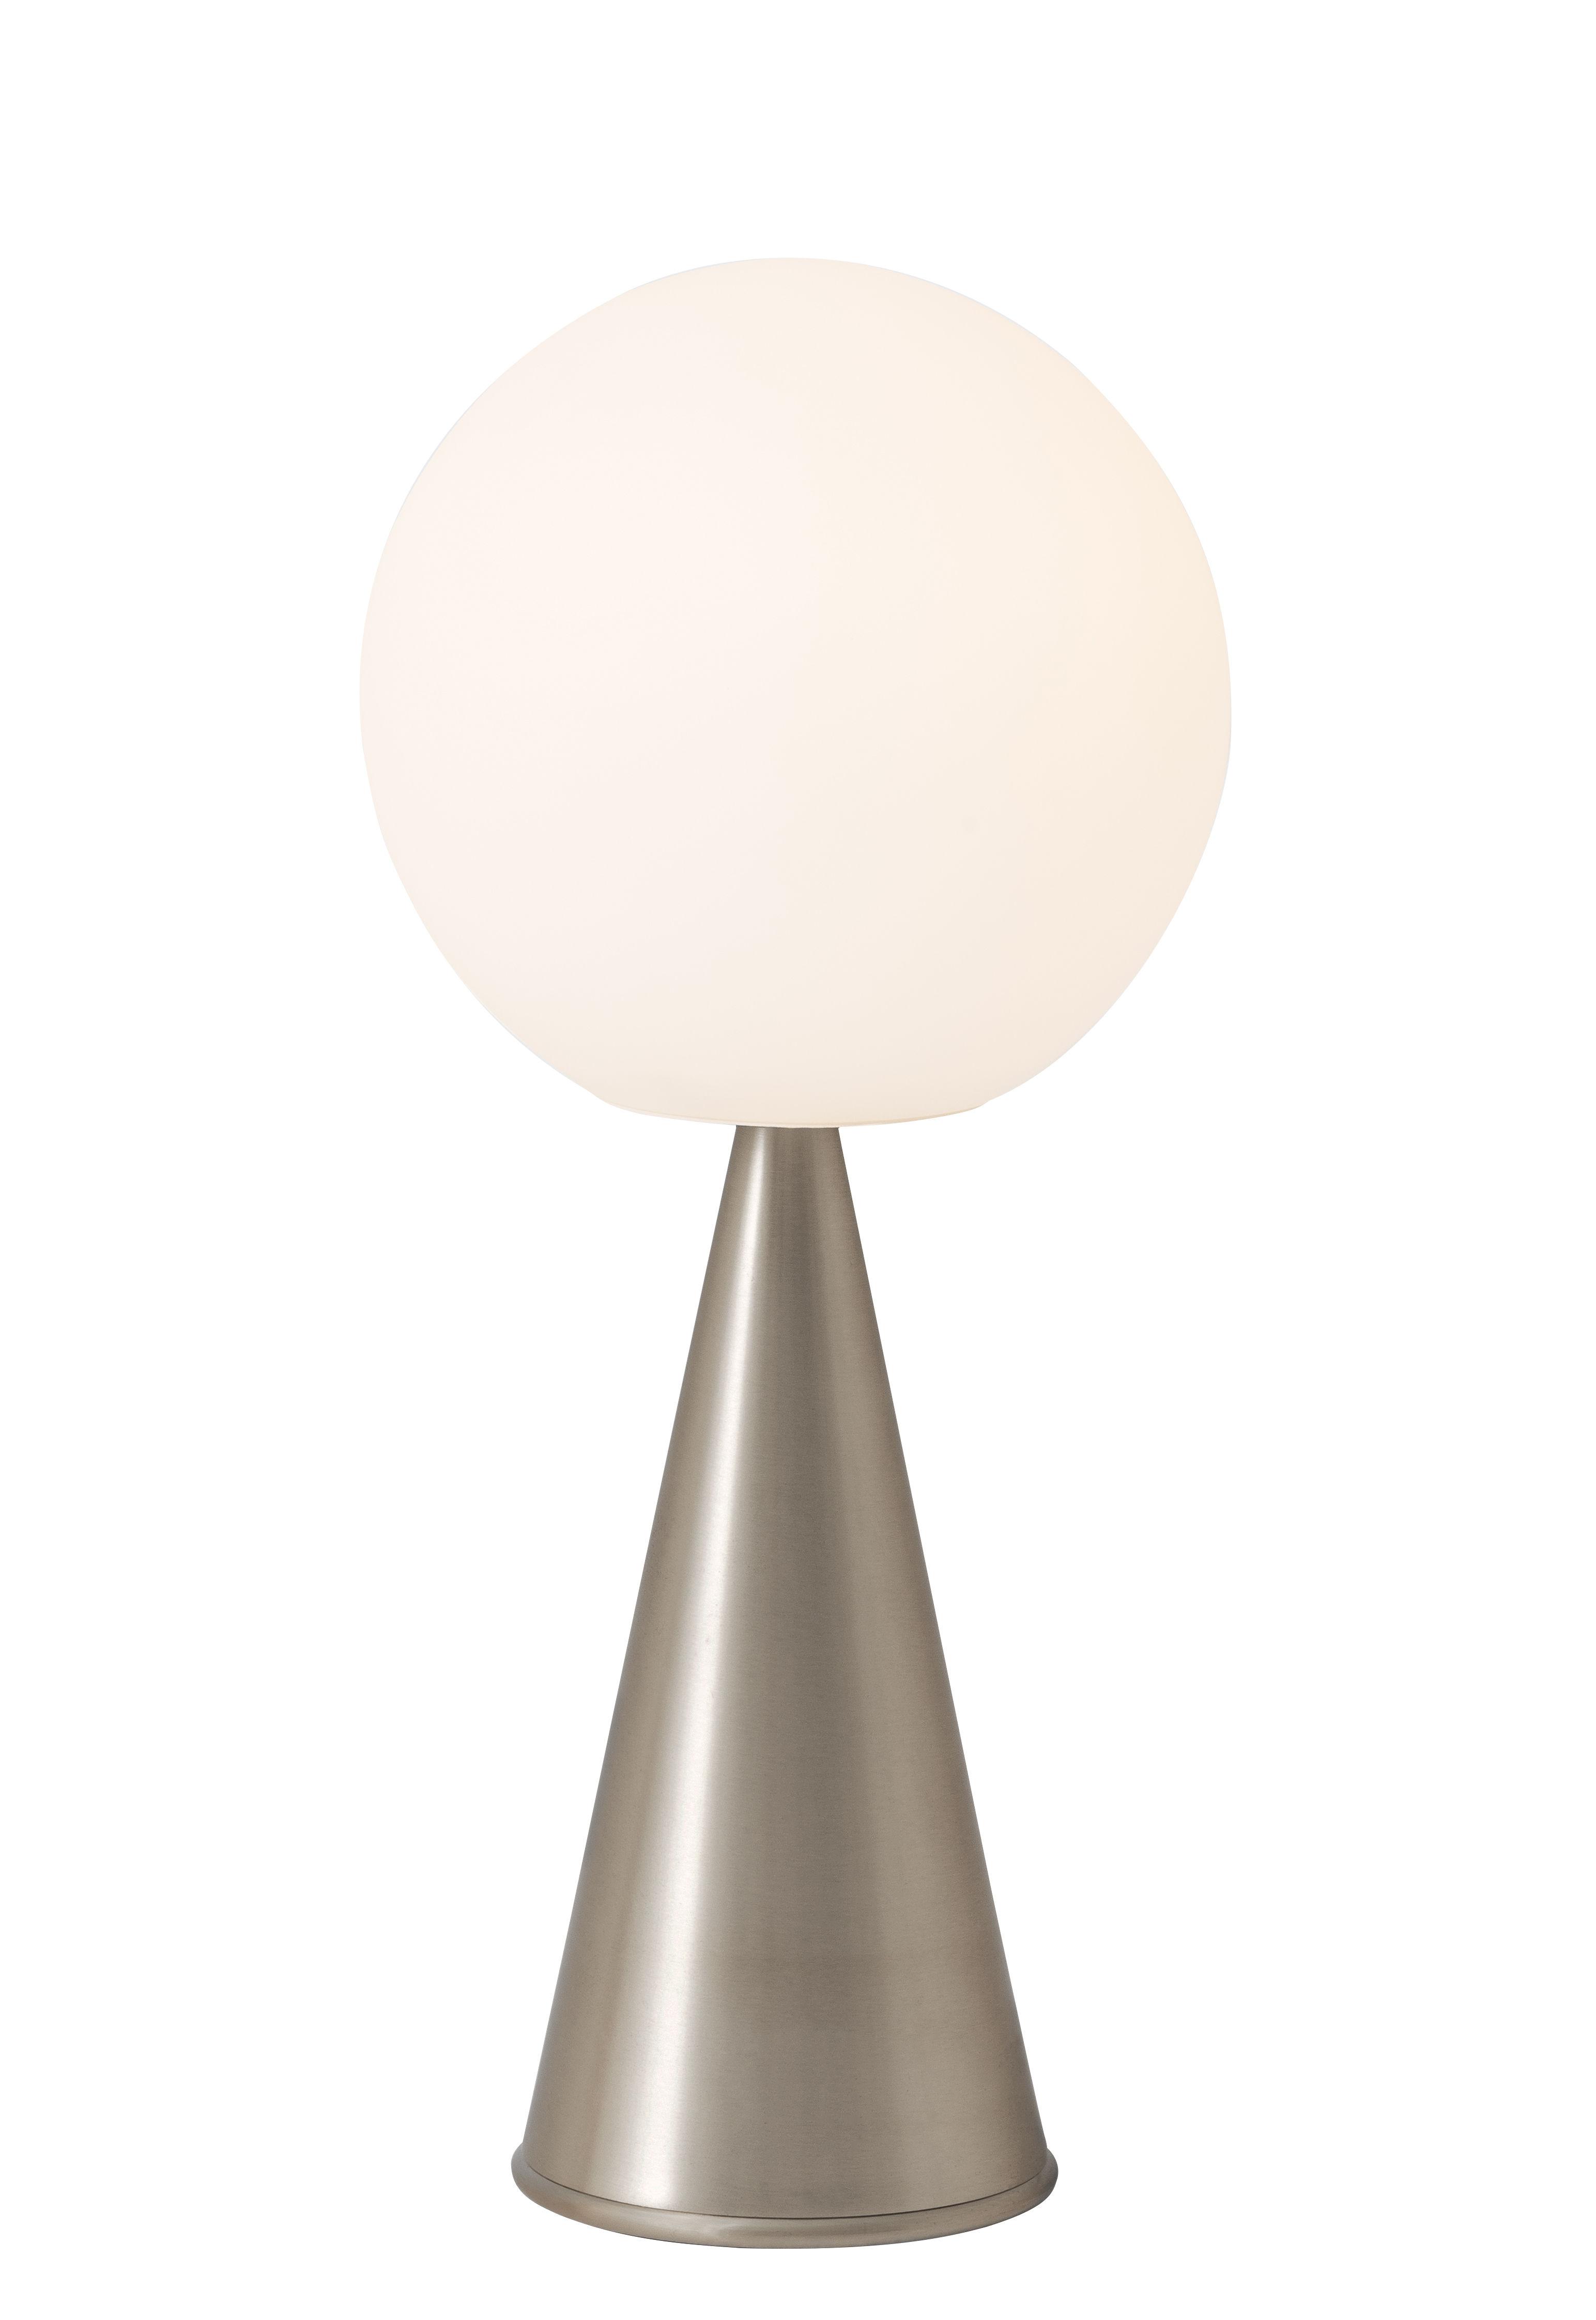 Luminaire - Lampes de table - Lampe de table Bilia / H 43 cm - By Gio Ponti (1932) - Fontana Arte - Nickel - Métal nickelé brossé, Verre soufflé satiné